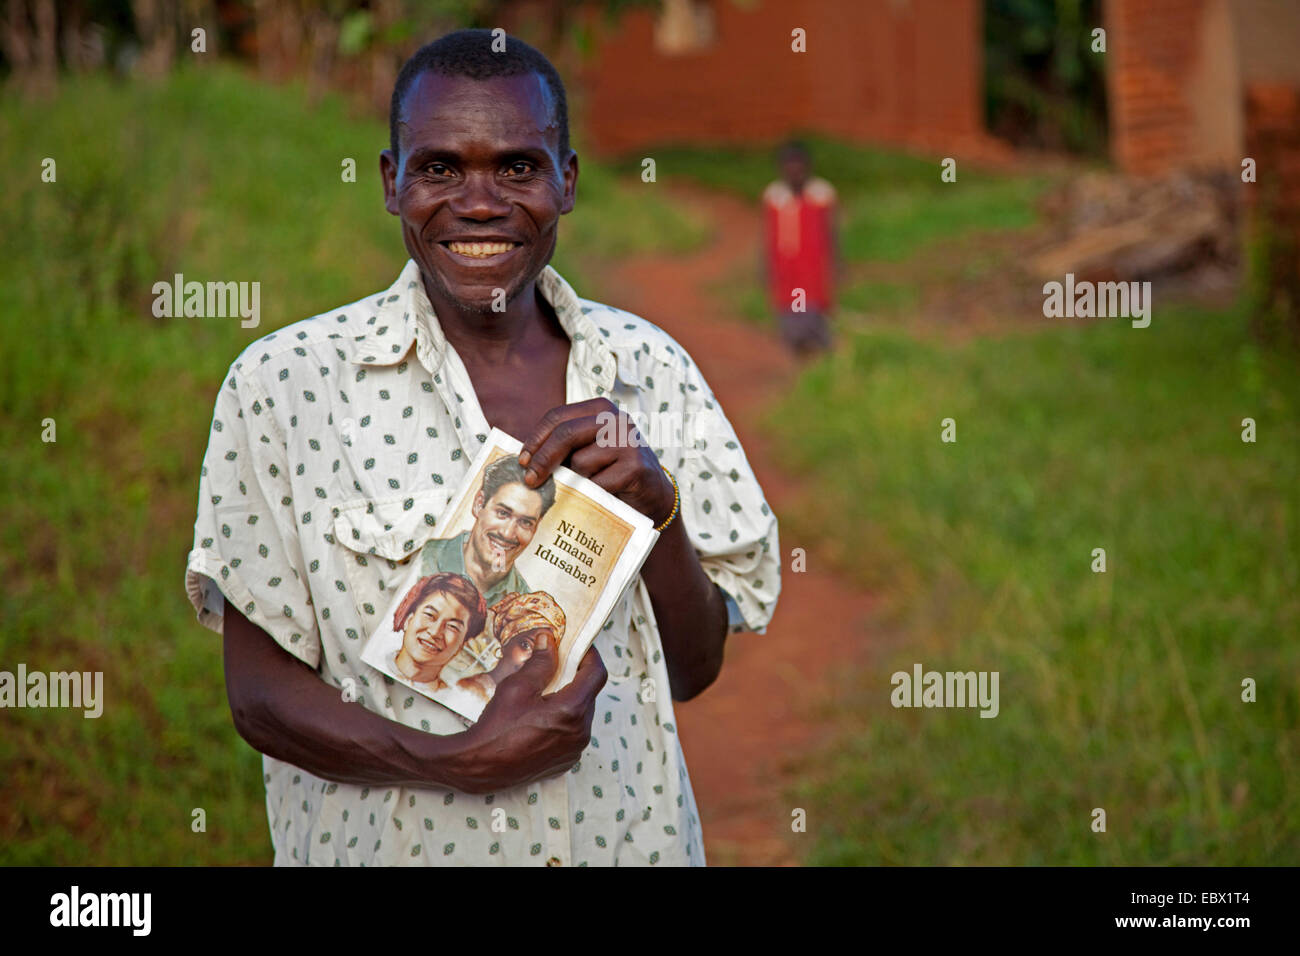 man showing a religious book, Burundi, Makamba, Makamba - Stock Image